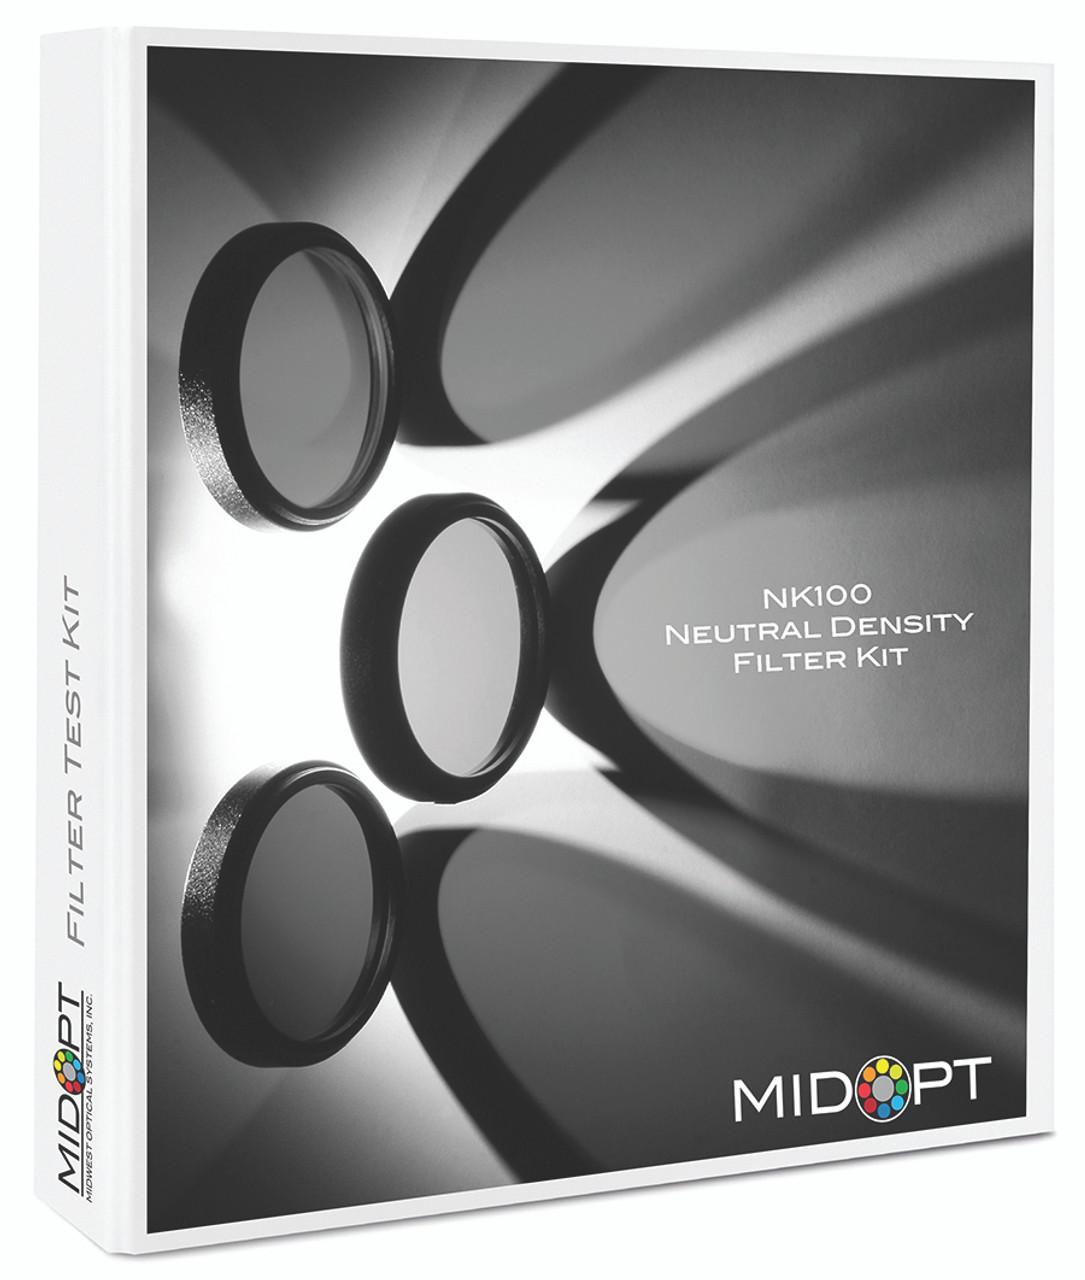 NK100 Neutral Density Filter Binder Kit